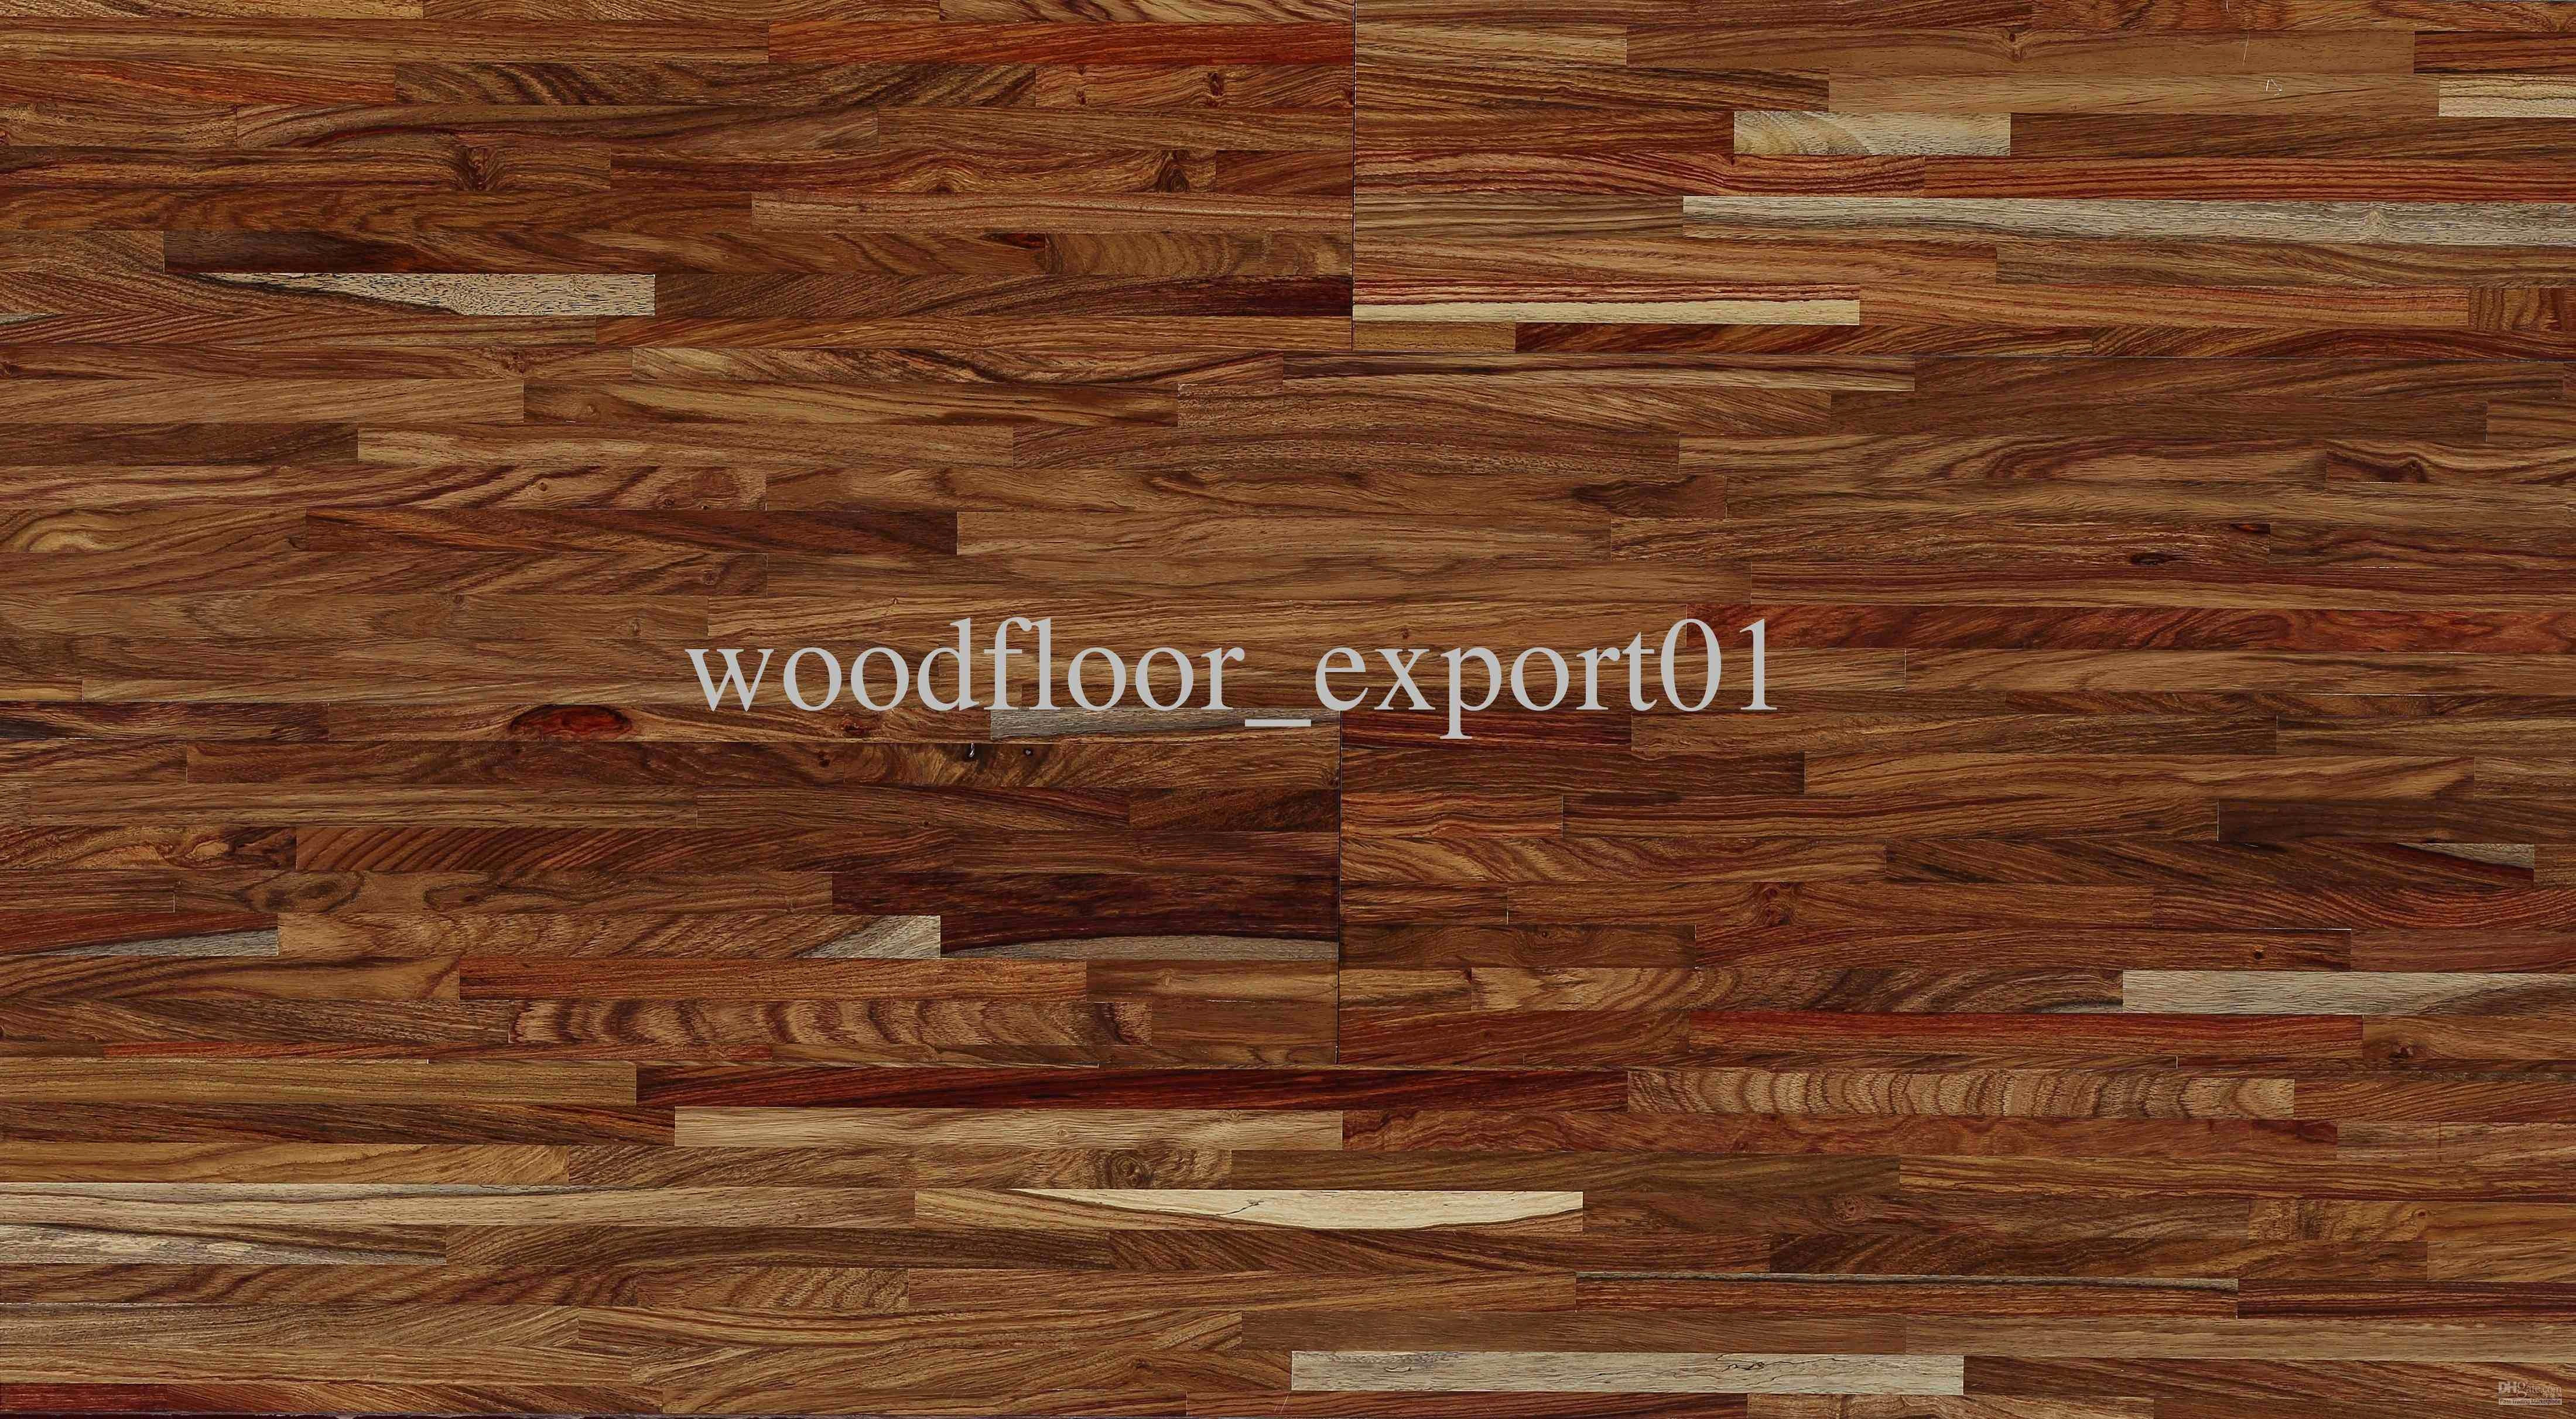 hardwood floor trends 2018 of 15 unique types of hardwood flooring image dizpos com throughout types of hardwood flooring awesome 50 inspirational sanding and refinishing hardwood floors graphics image of 15